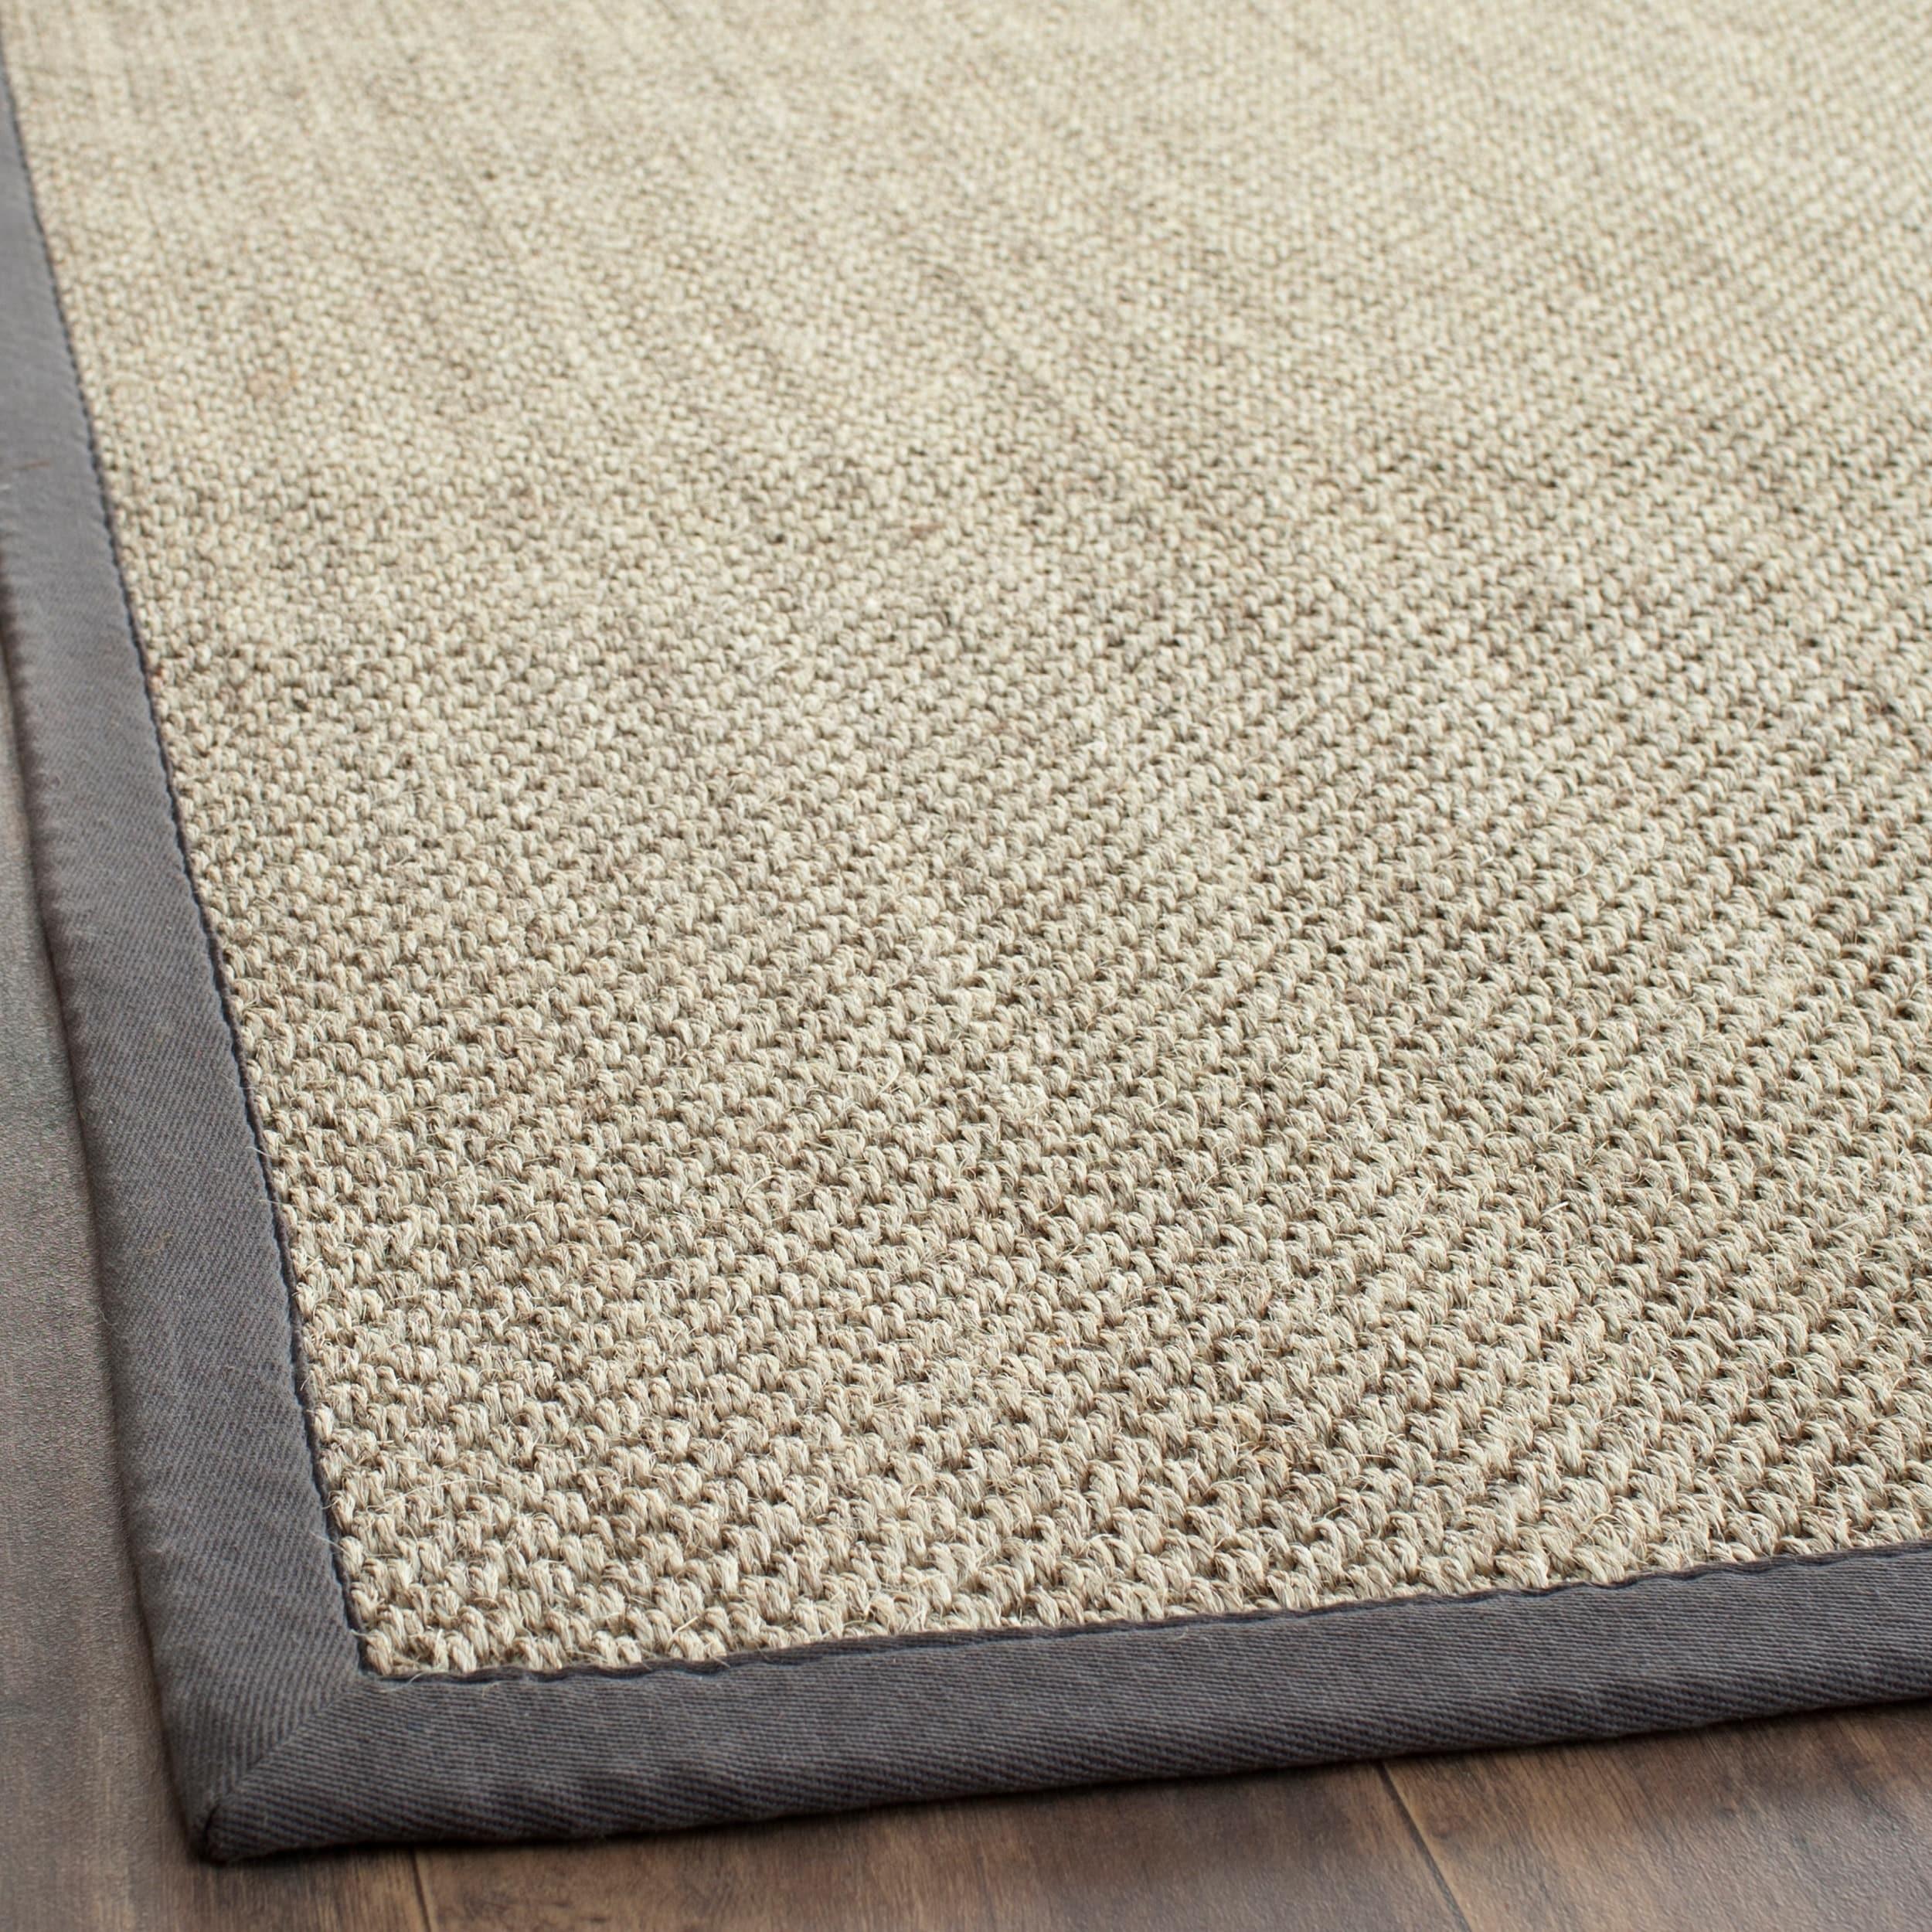 mat direct cabana a sisal chunky create rug mats rugs